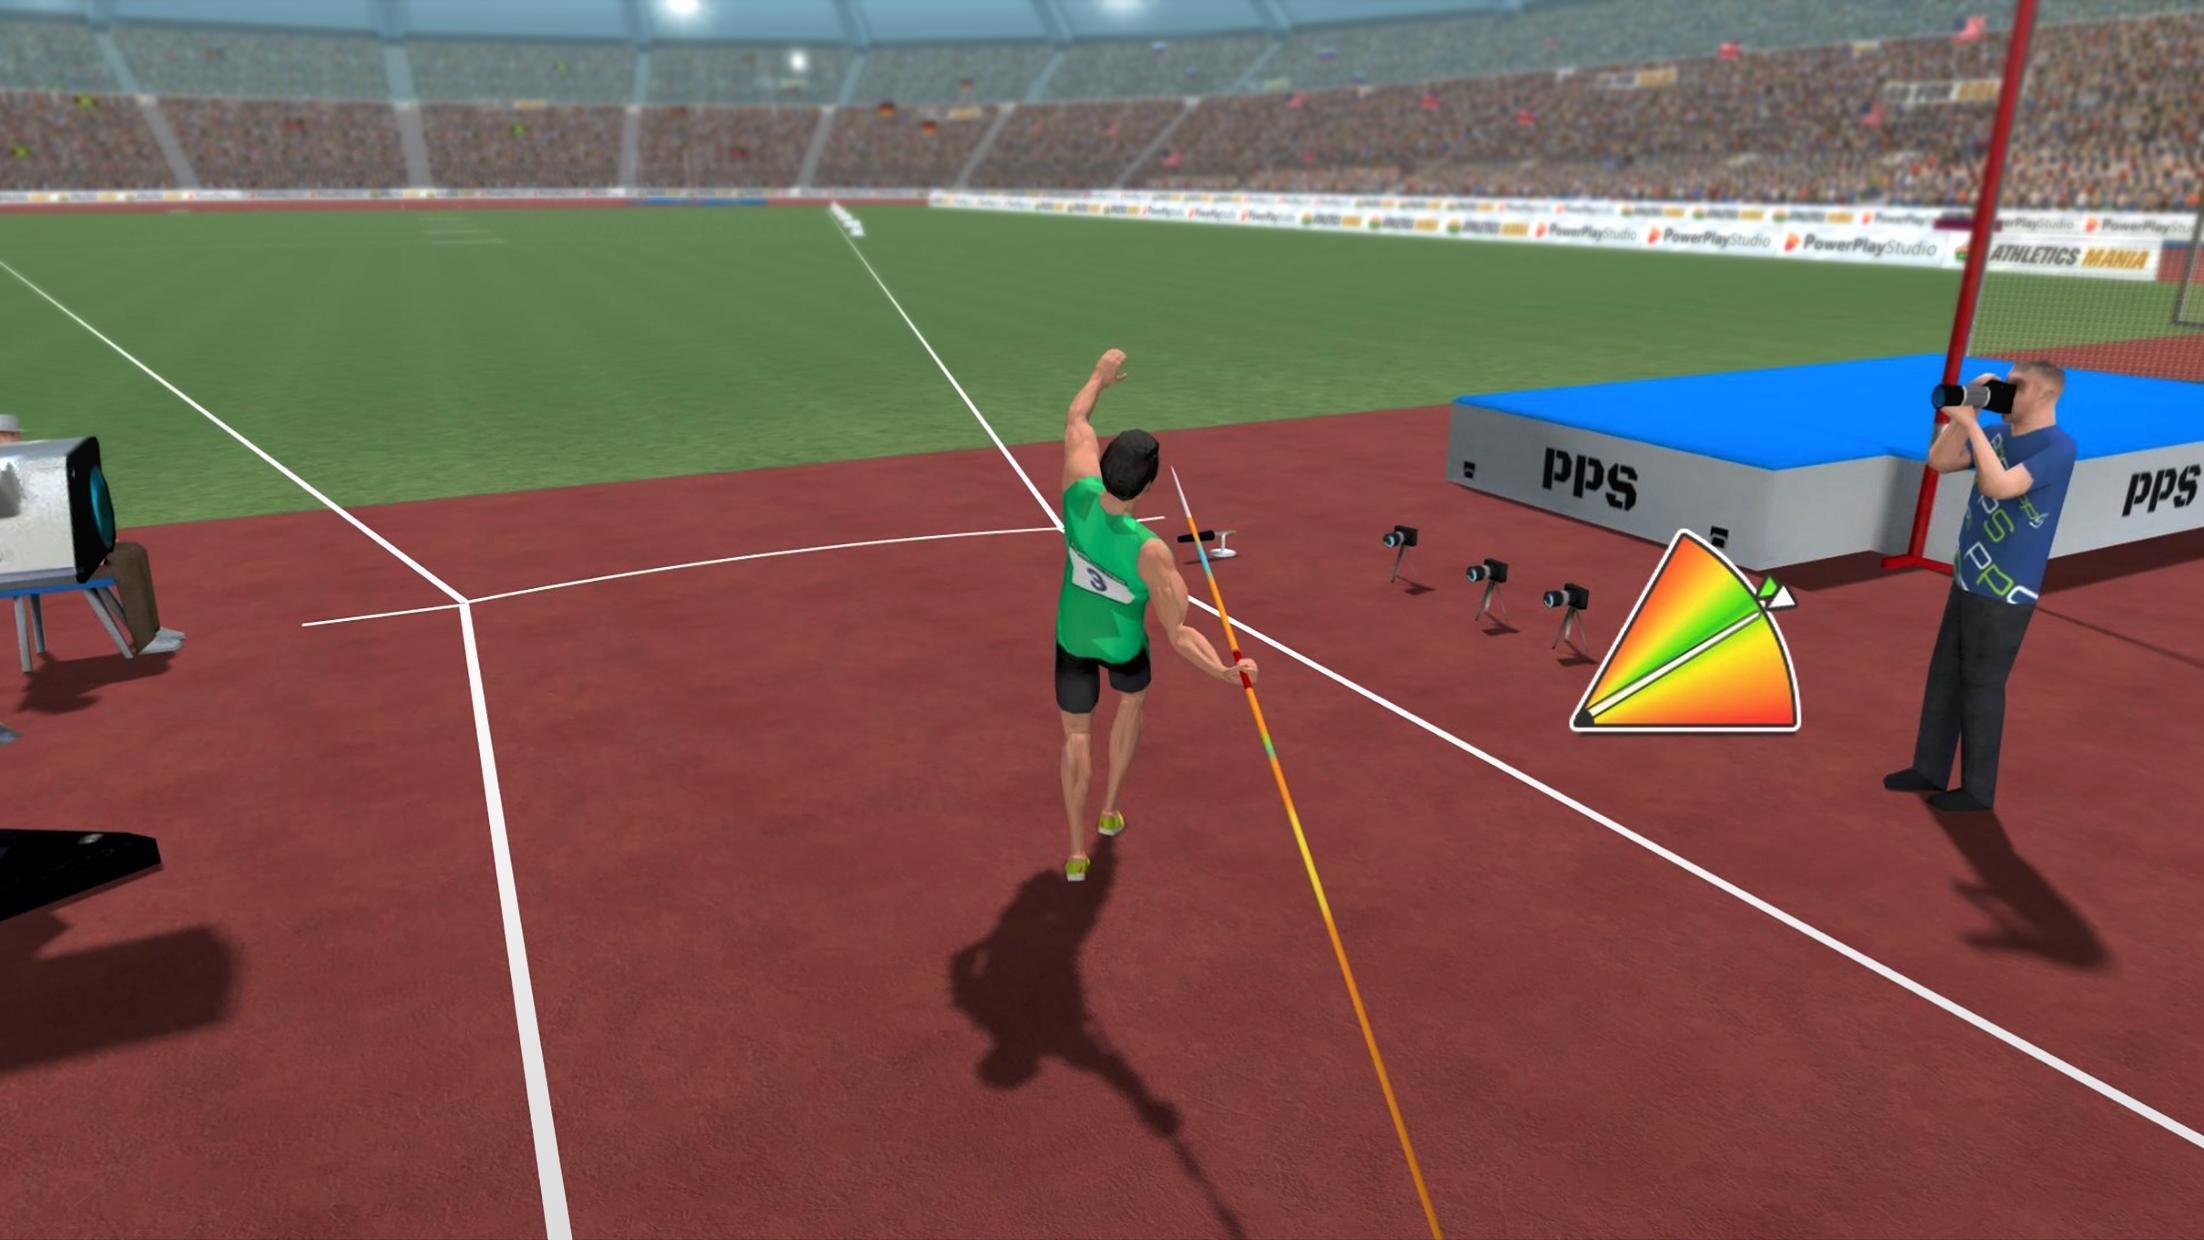 Athletics Mania: Track & Field Summer Sports Game 游戏截图3